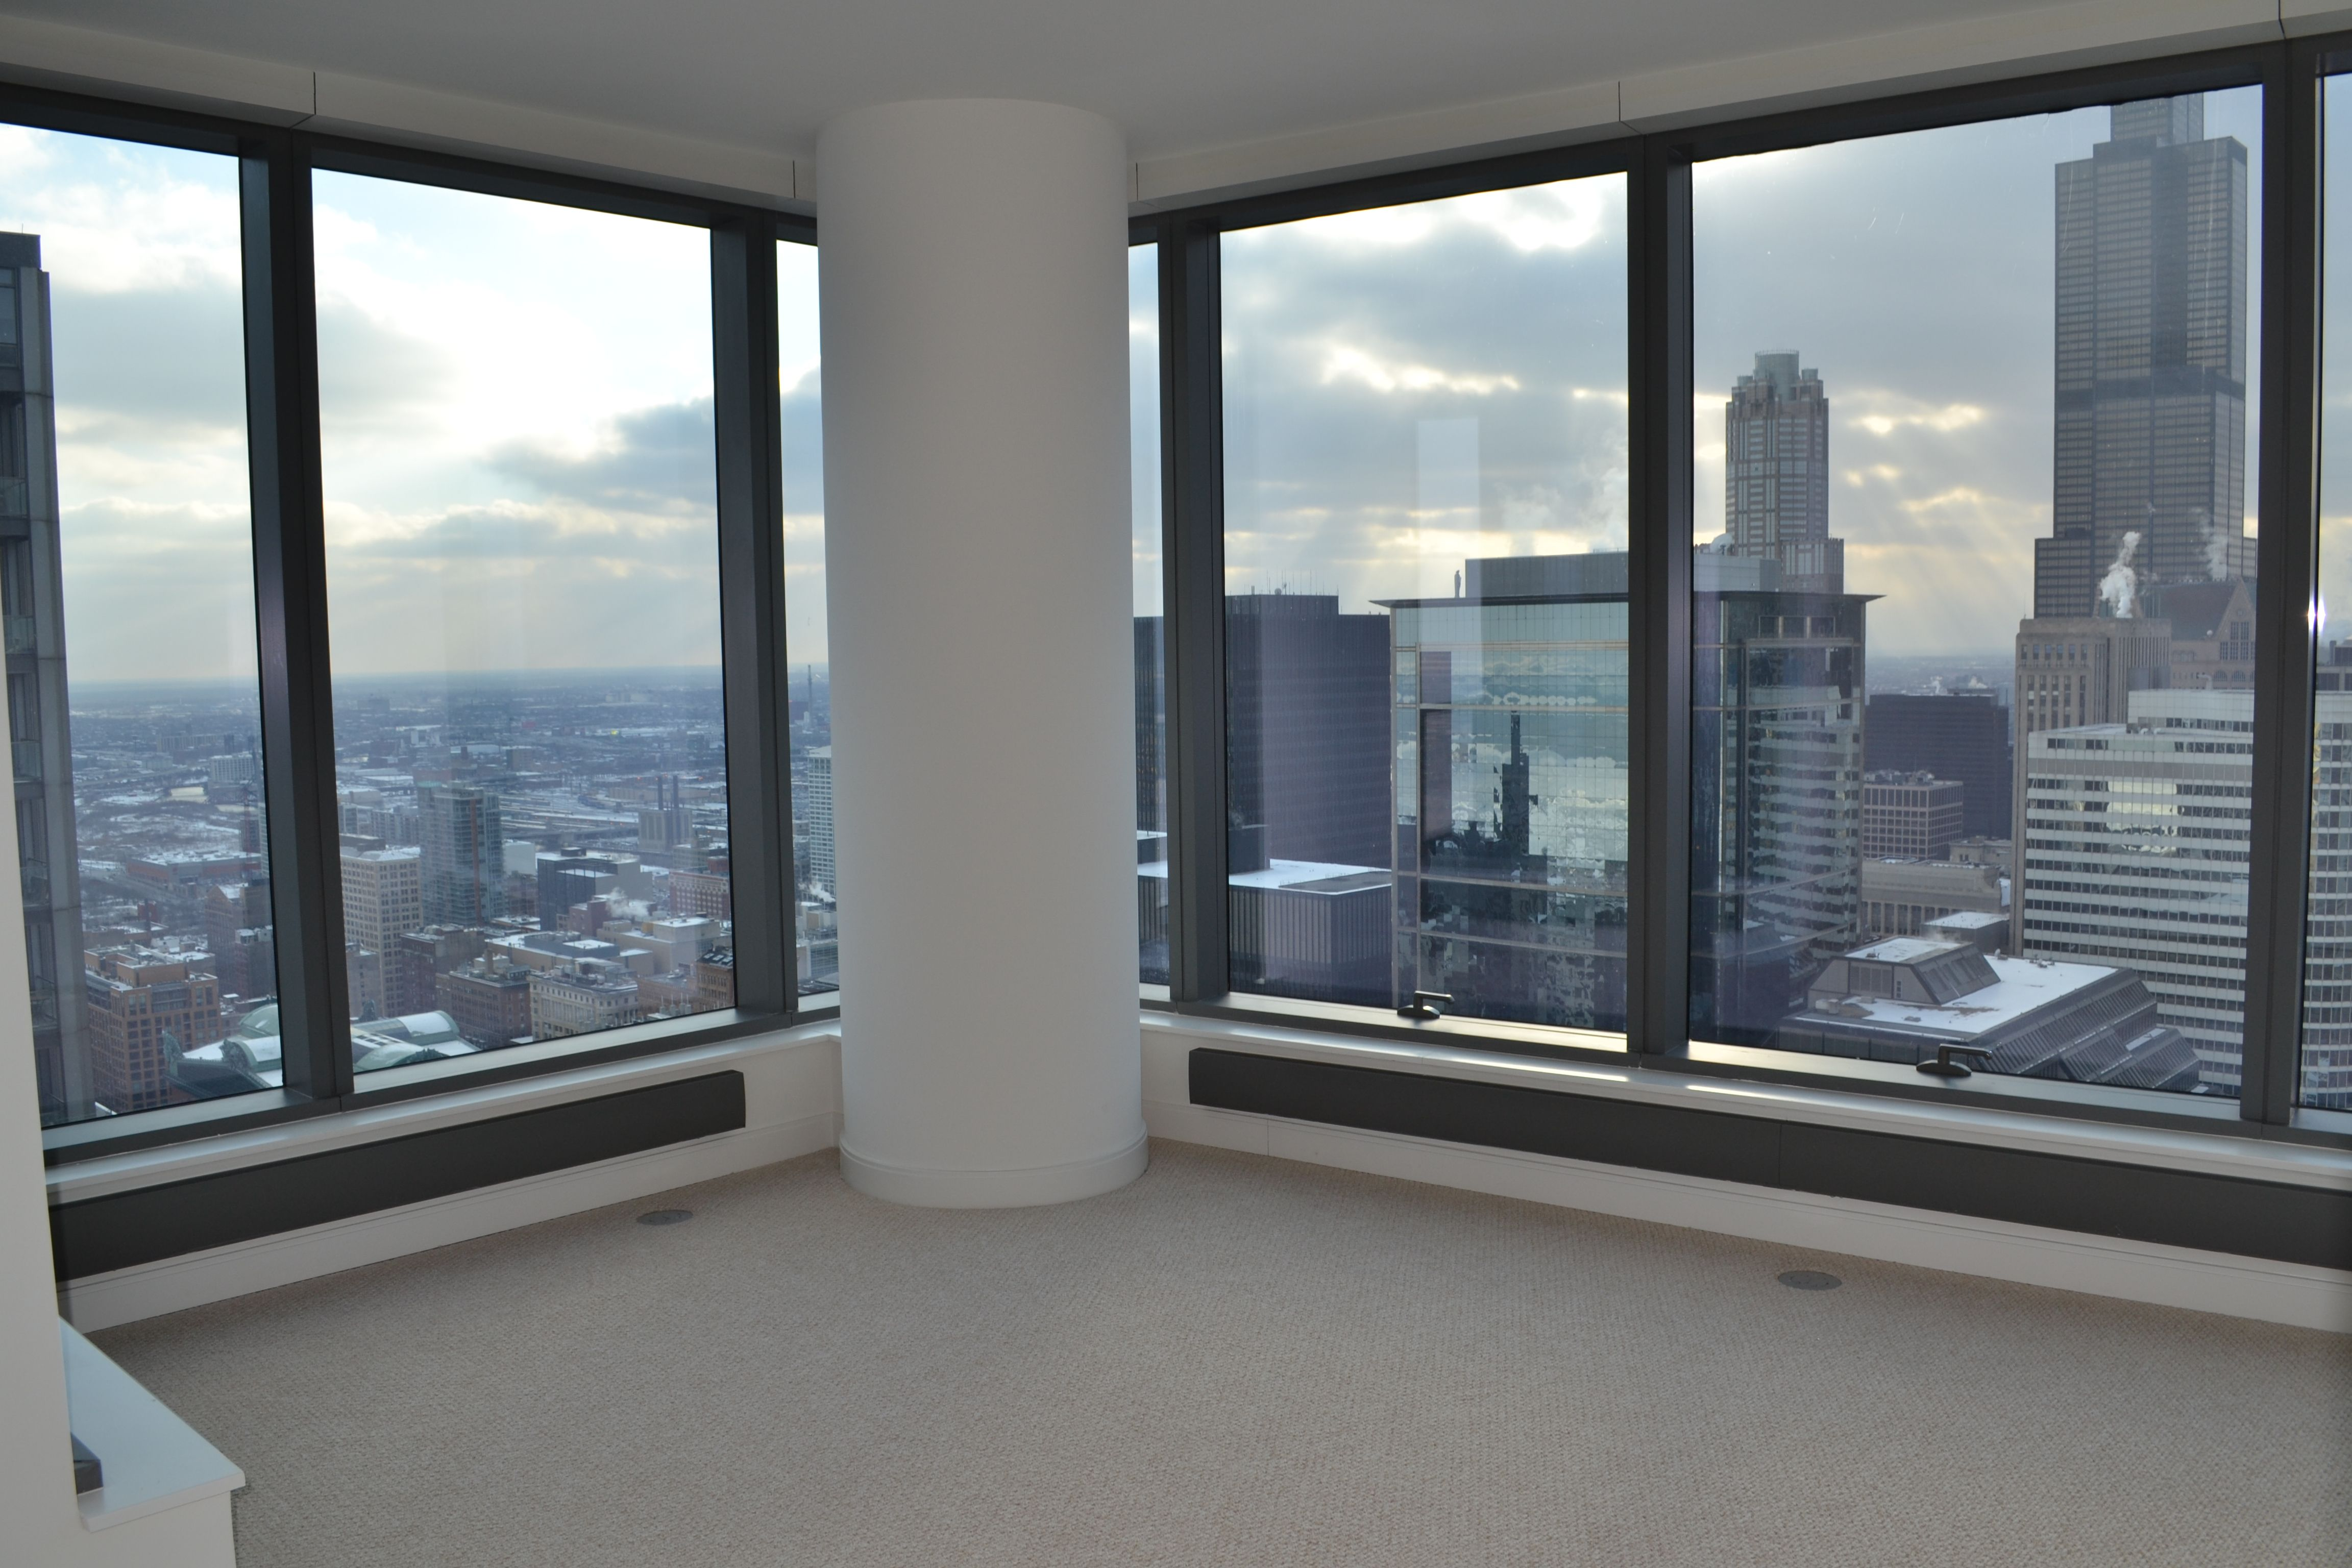 49th Floor 2 Bedroom / 2 Bathroom Luxury Apartment For